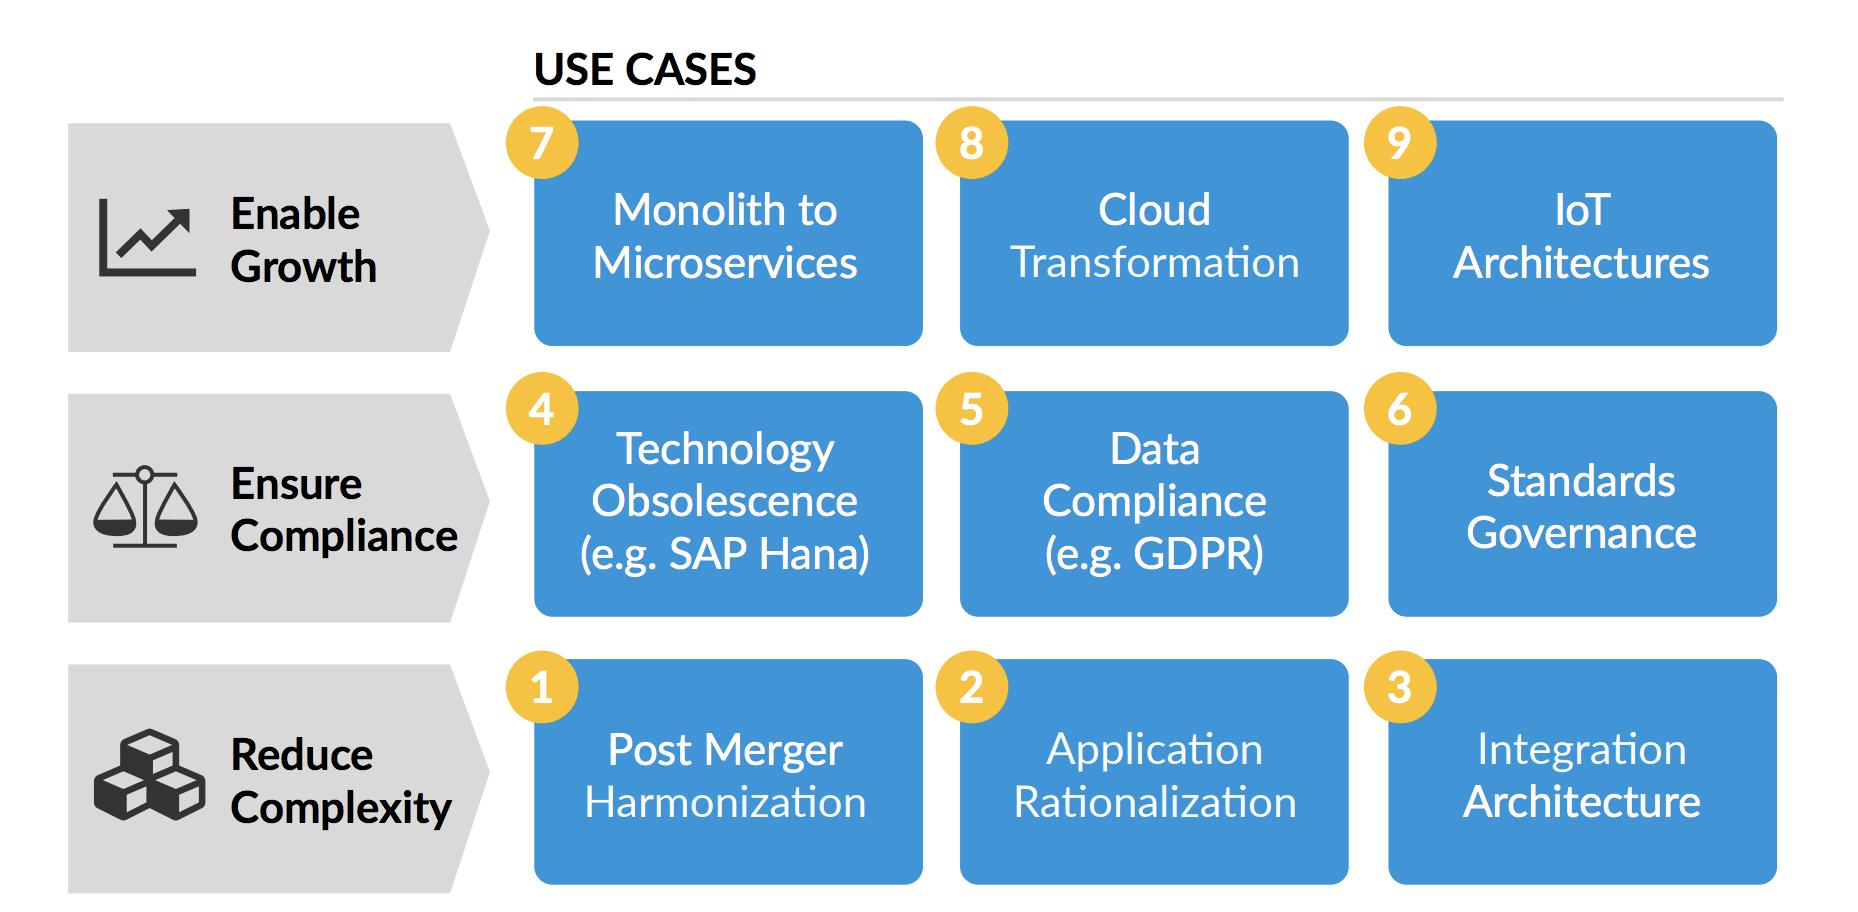 Key use cases for enterprise architecture